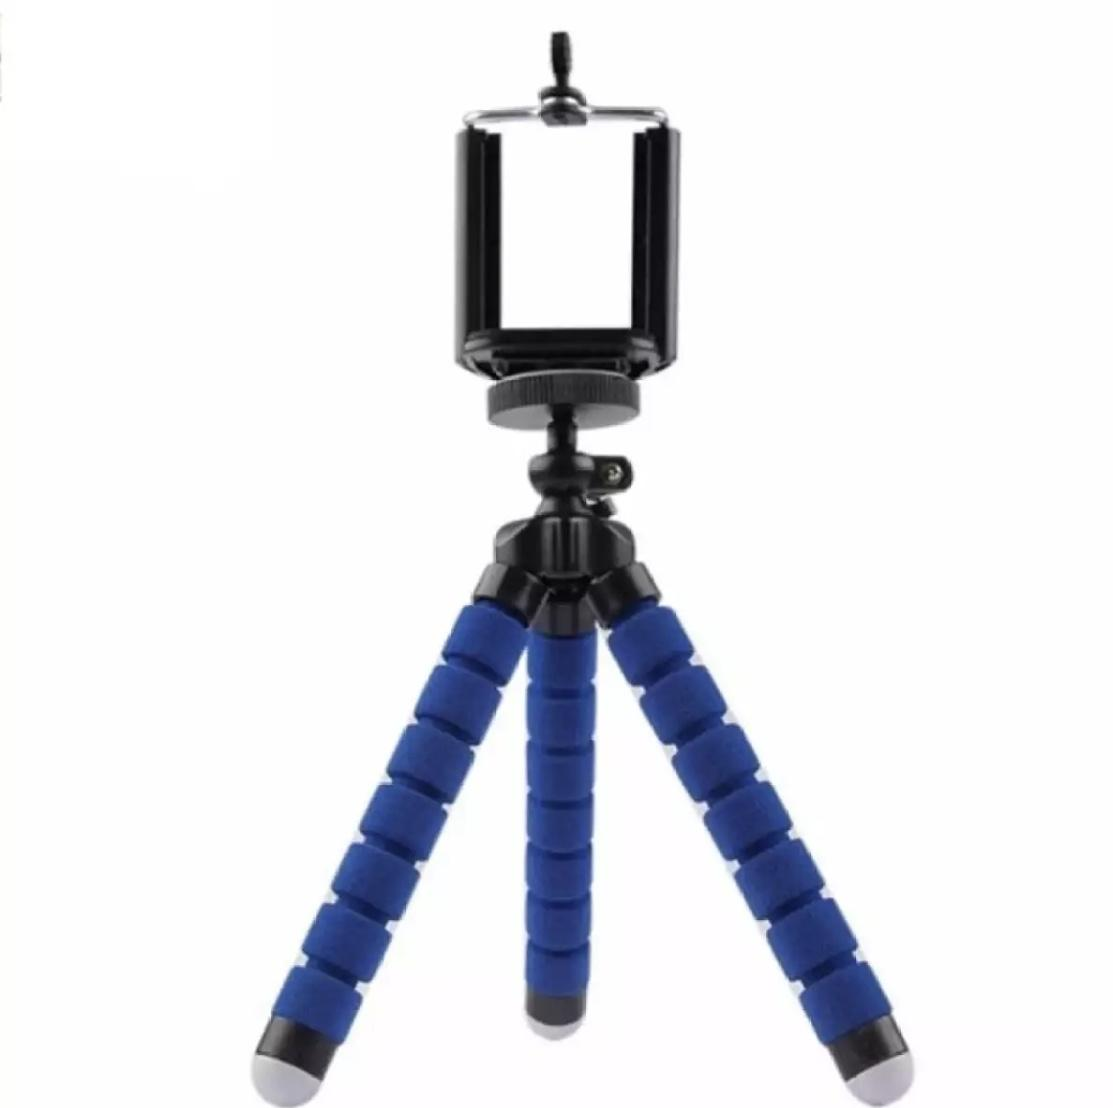 Tripods For Sale Camera Prices Brands Specs In Tripod Somita St 3110 Monkey Pod Flexible Mini Dslr Dsc Camcorder Action Cam Digital